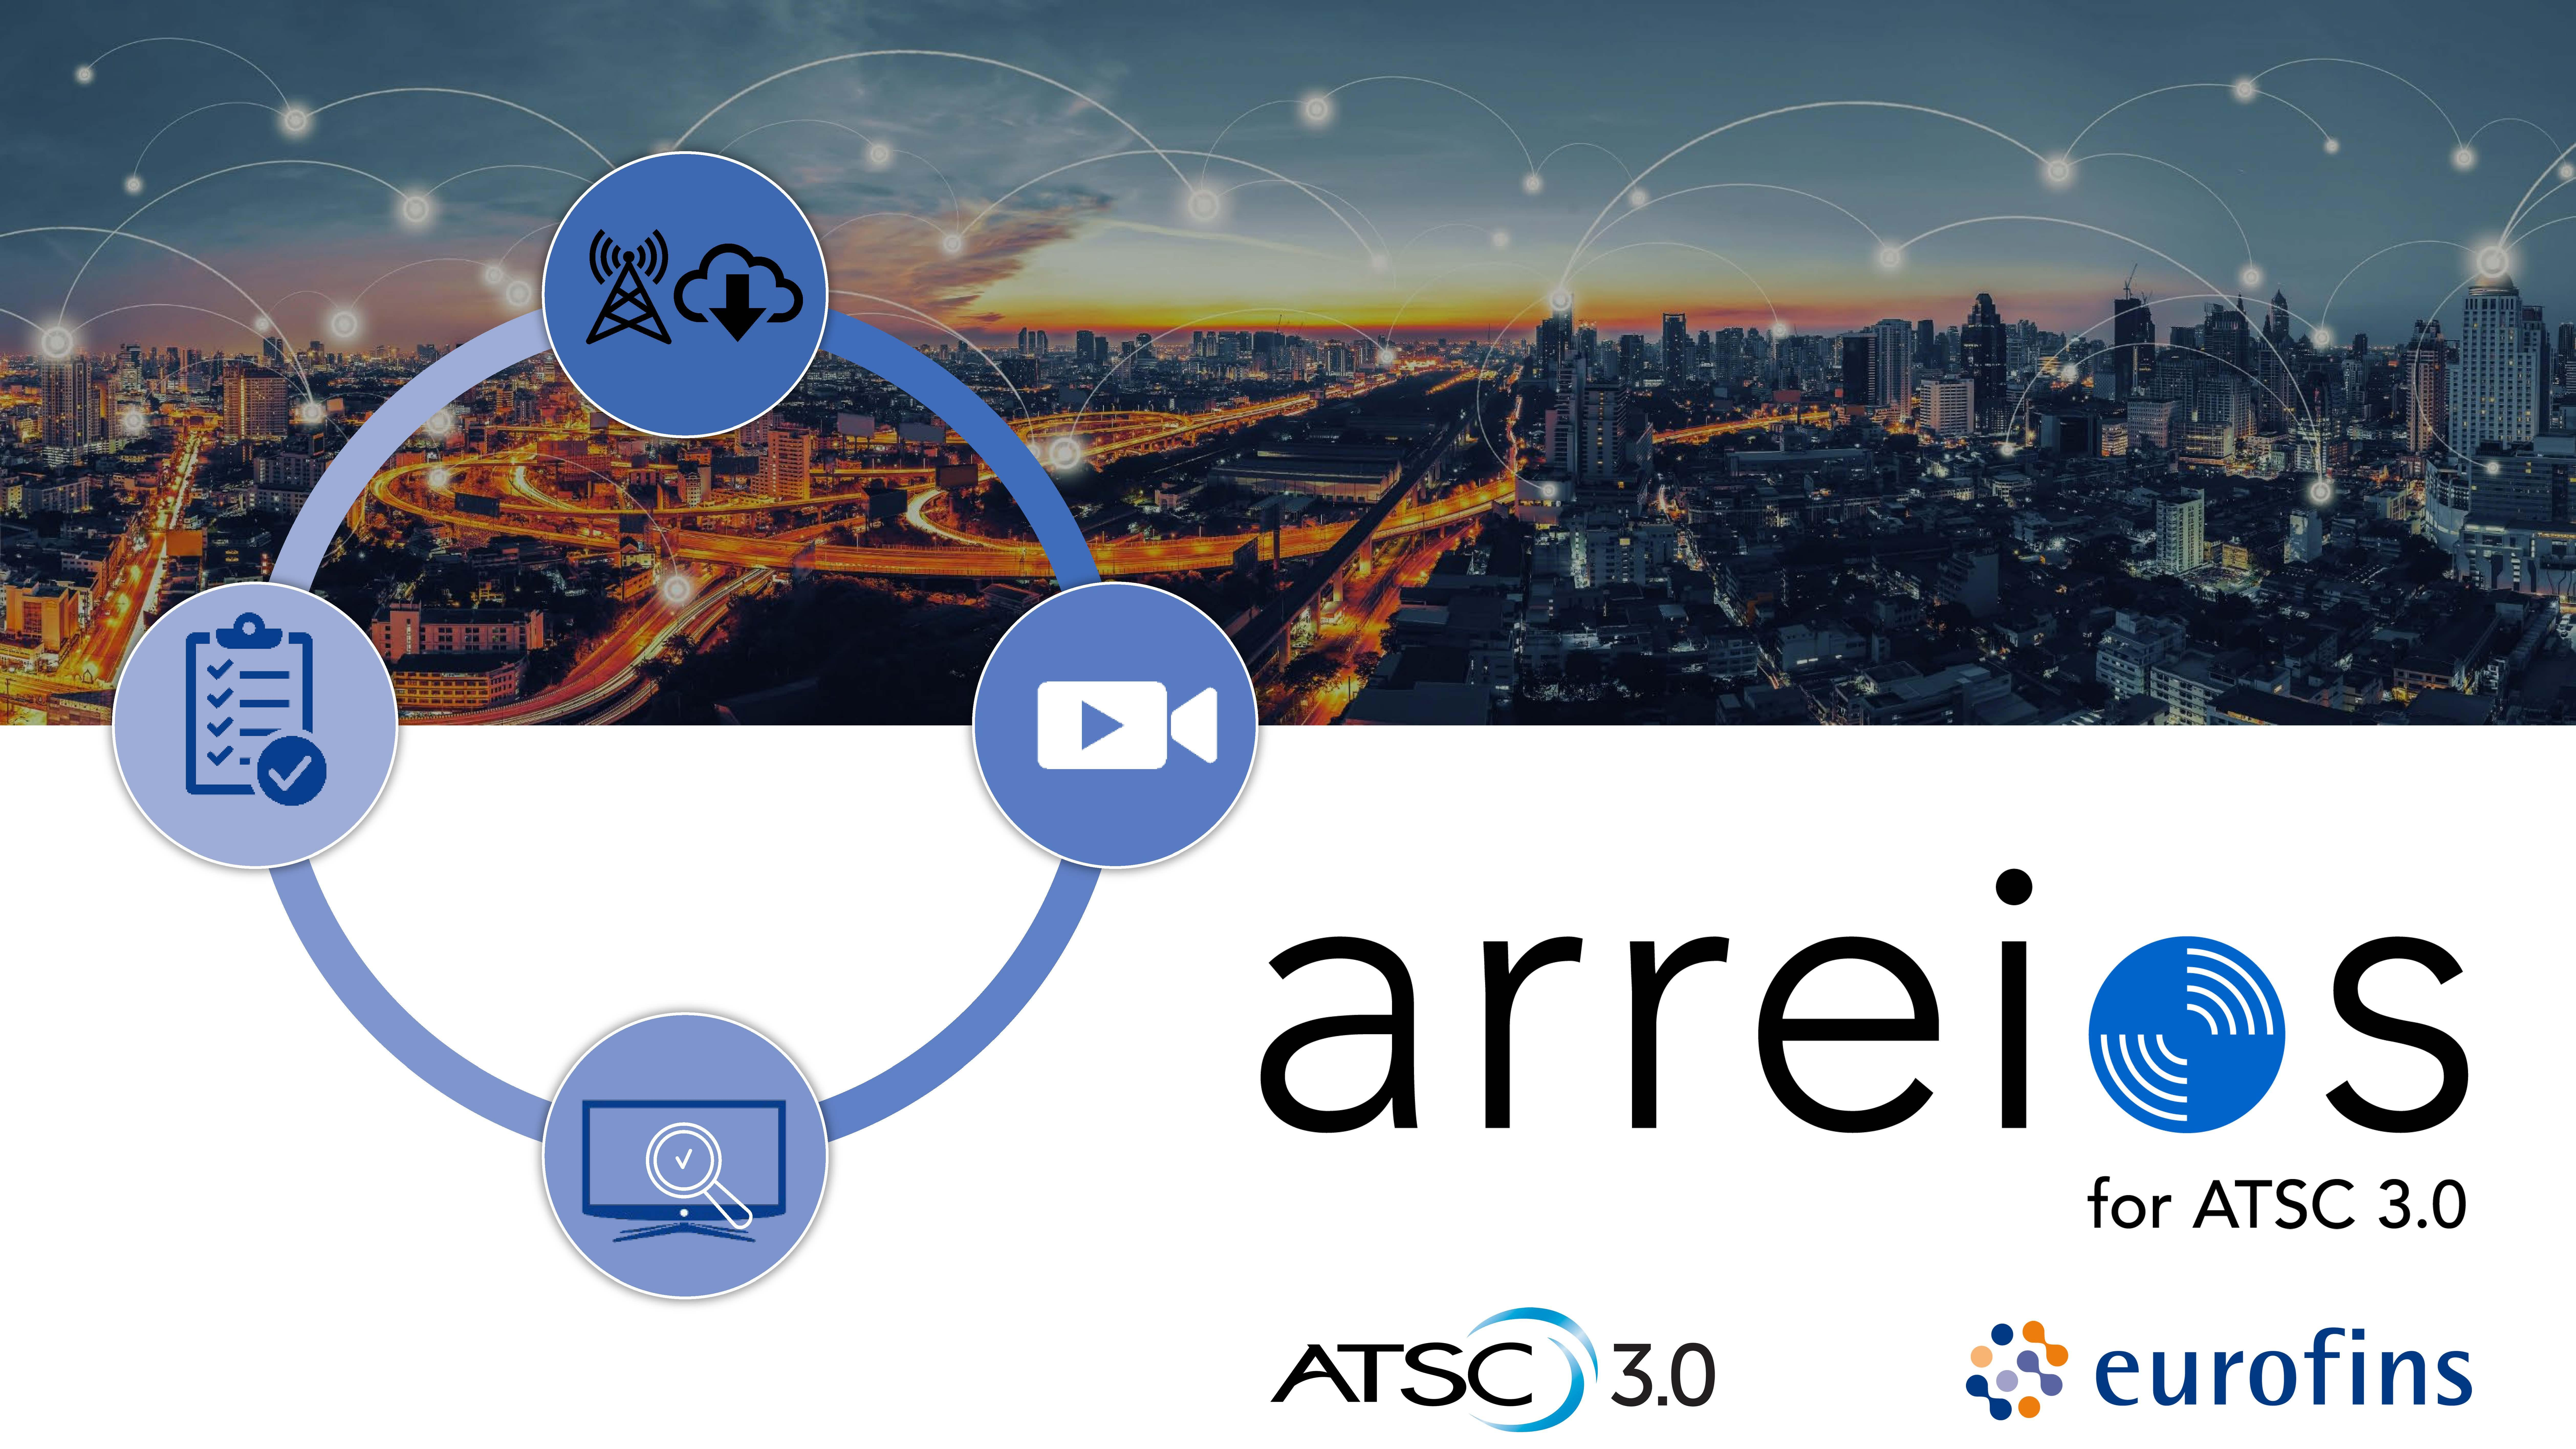 Arreios for ATSC 3.0